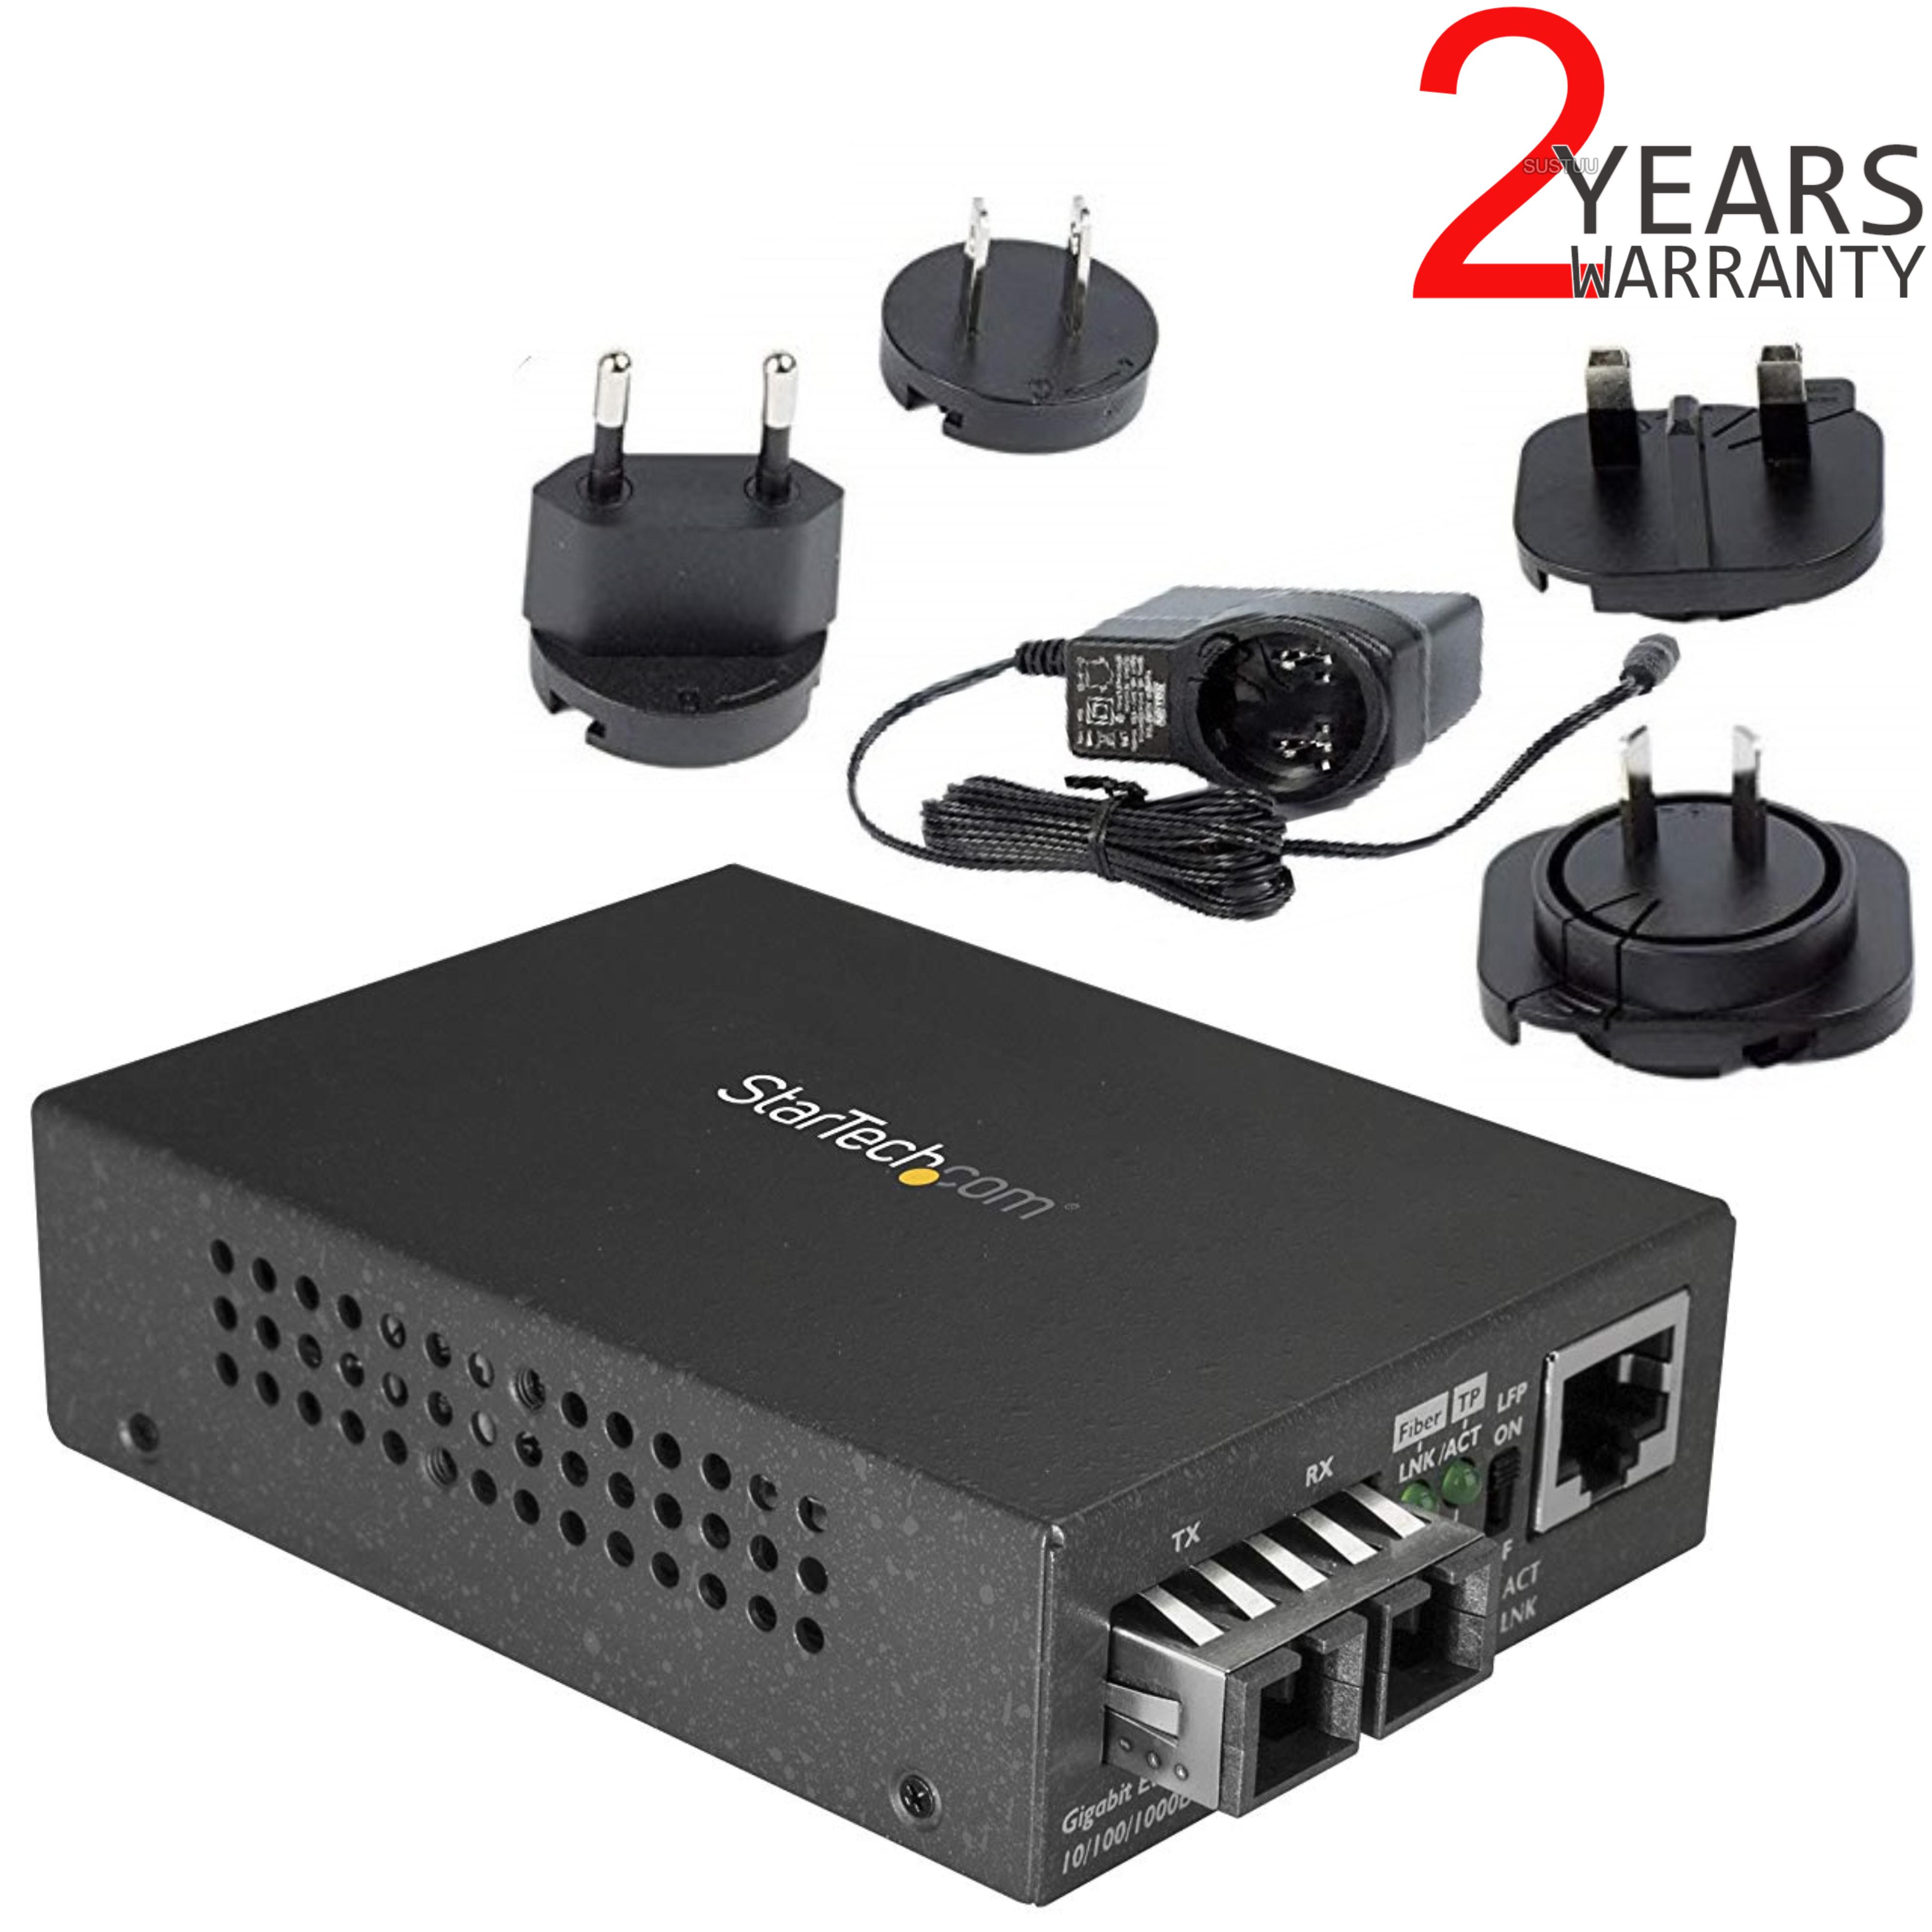 StarTech.com Gigabit Ethernet to SC Fiber Media Converter | 1000Base-LX | MCMGBSCSM1